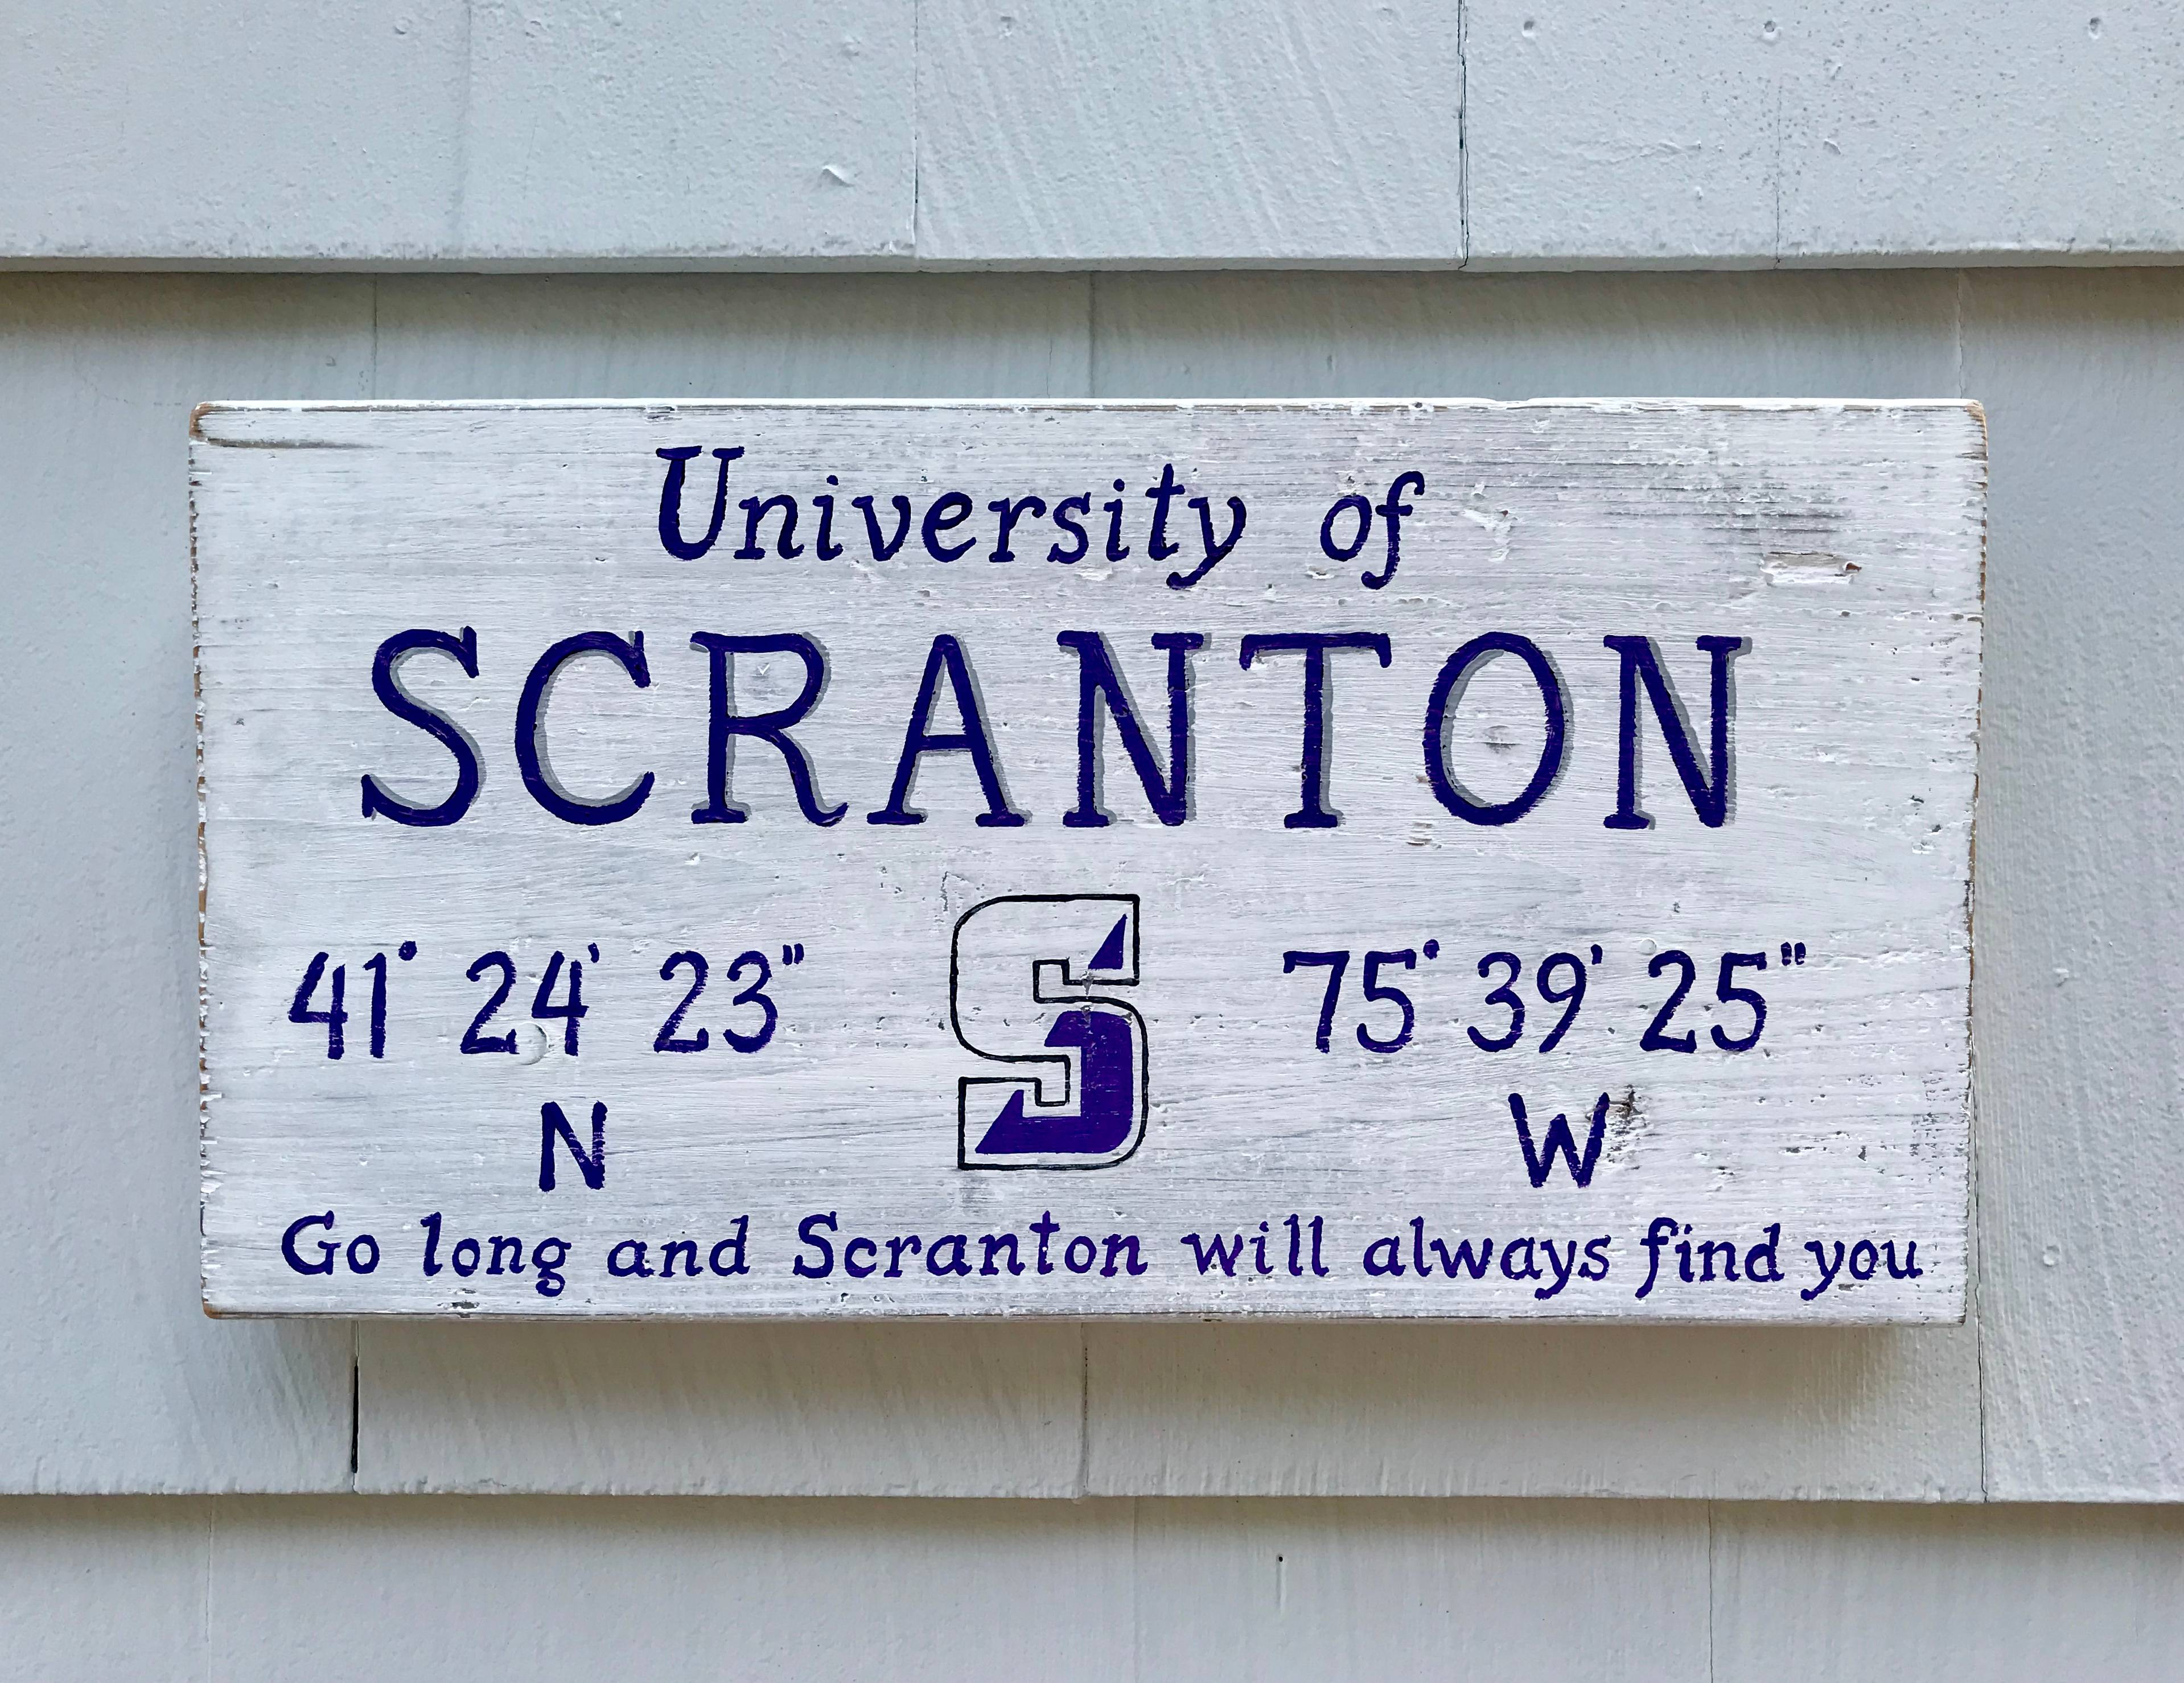 University of Scranton sign